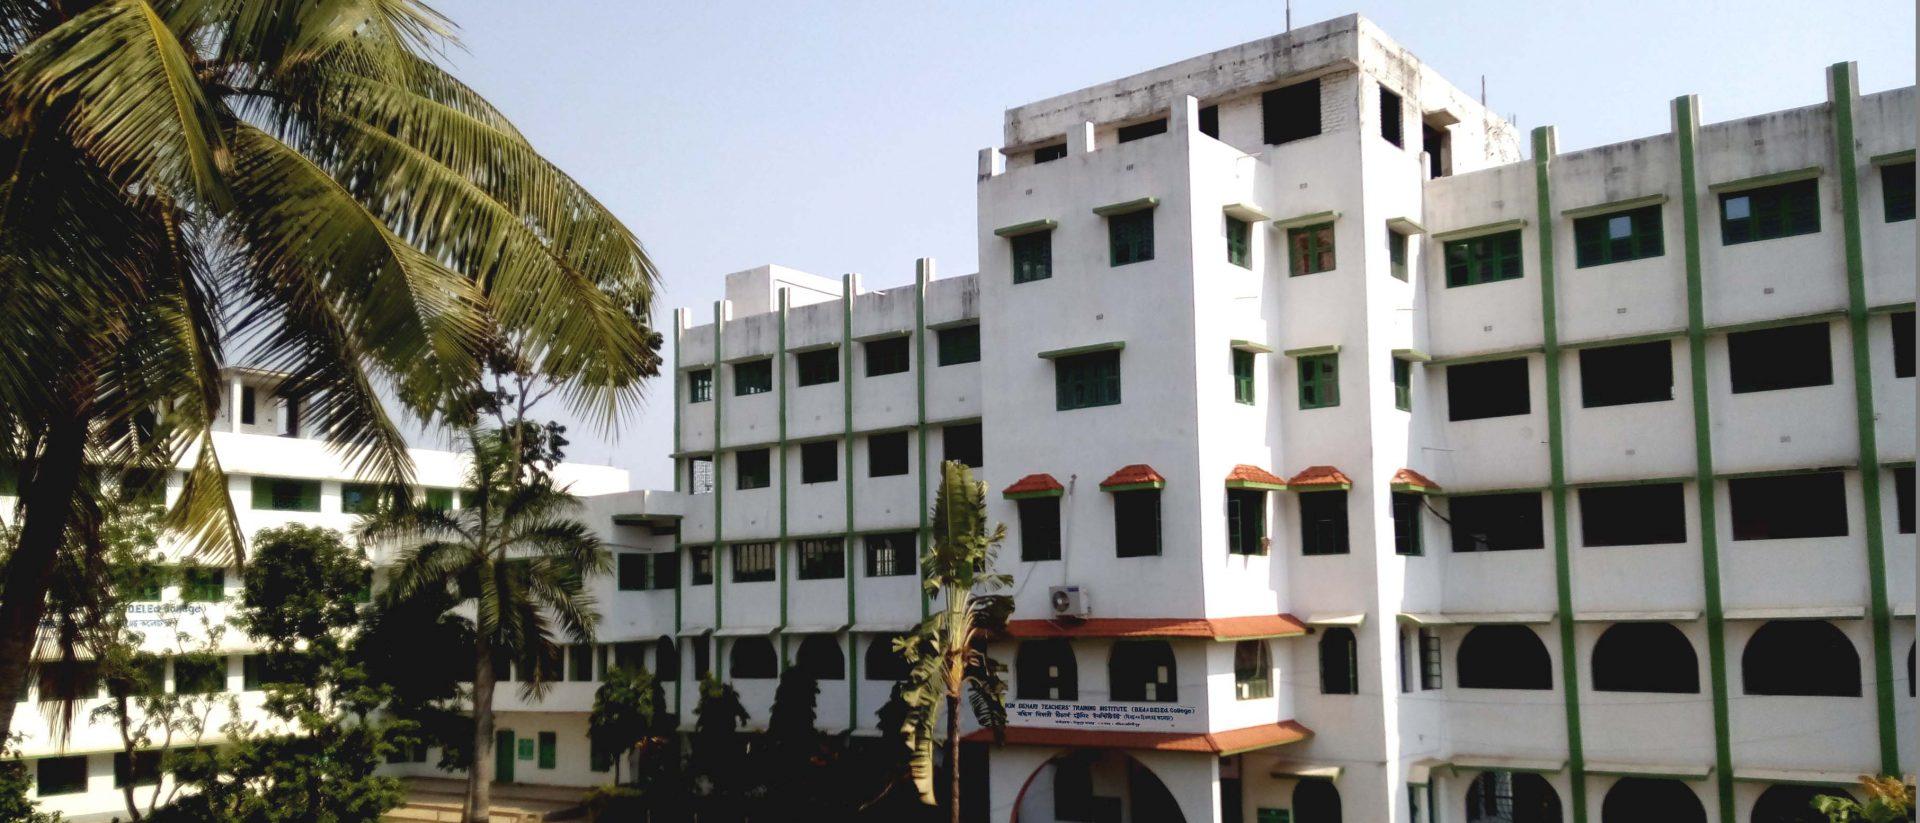 Bankim Behari Teachers Training Institute, Paschim Medinipur